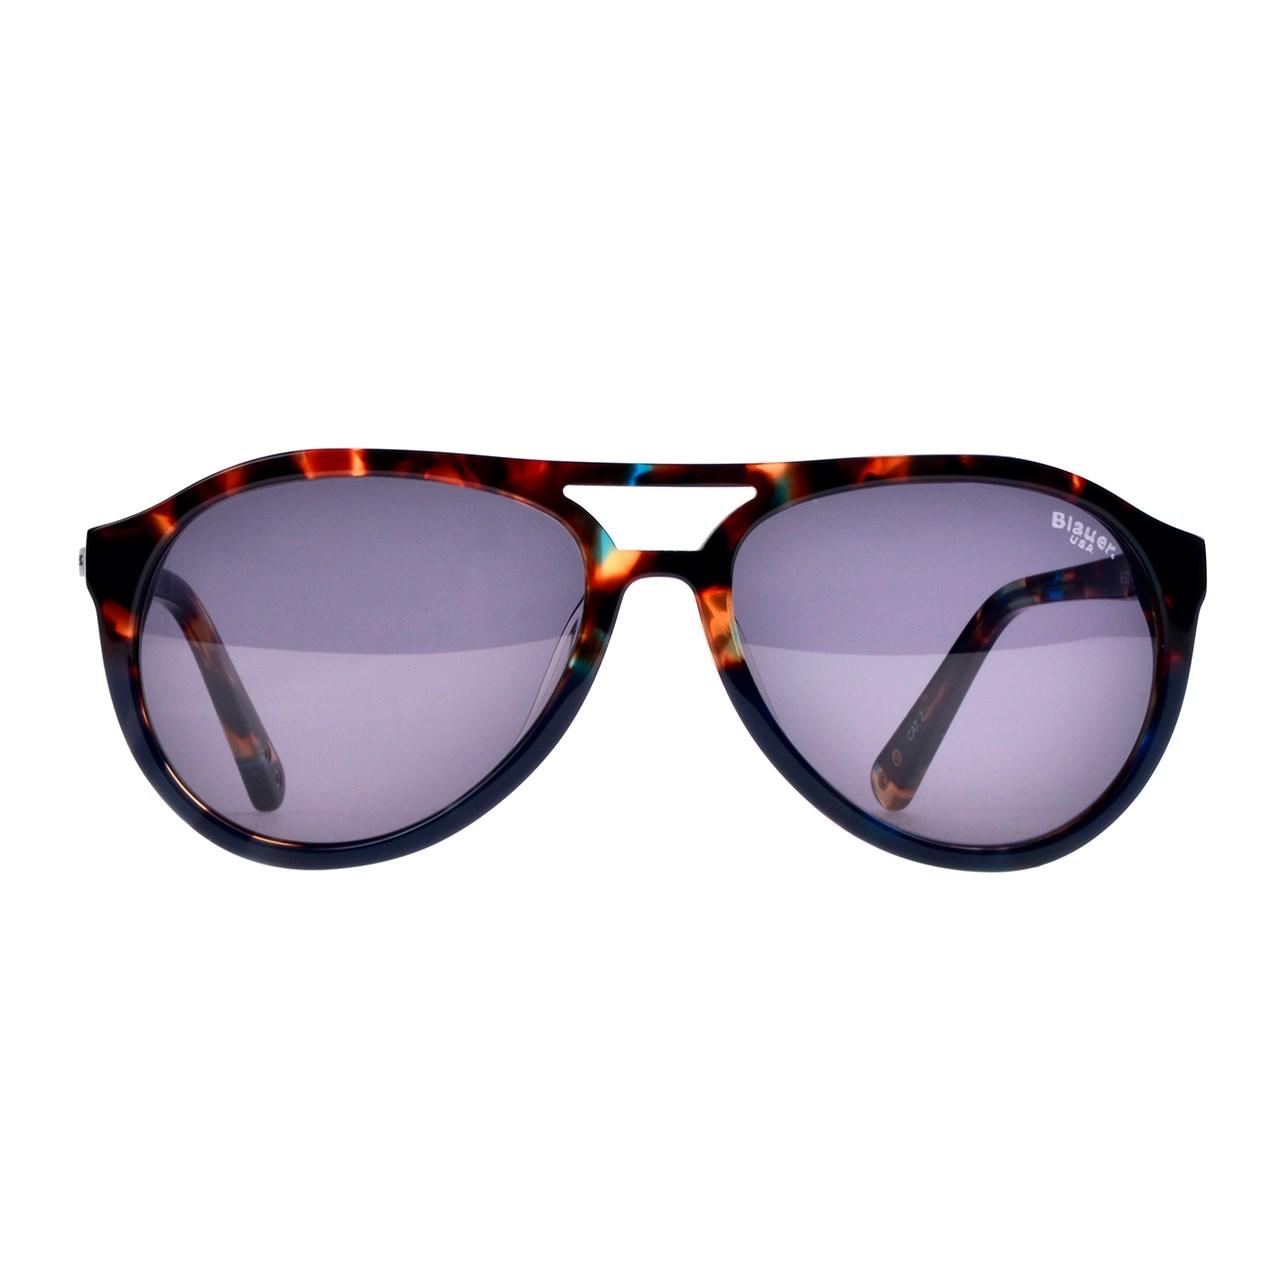 عینک آفتابی بلاور مدل BL502-06